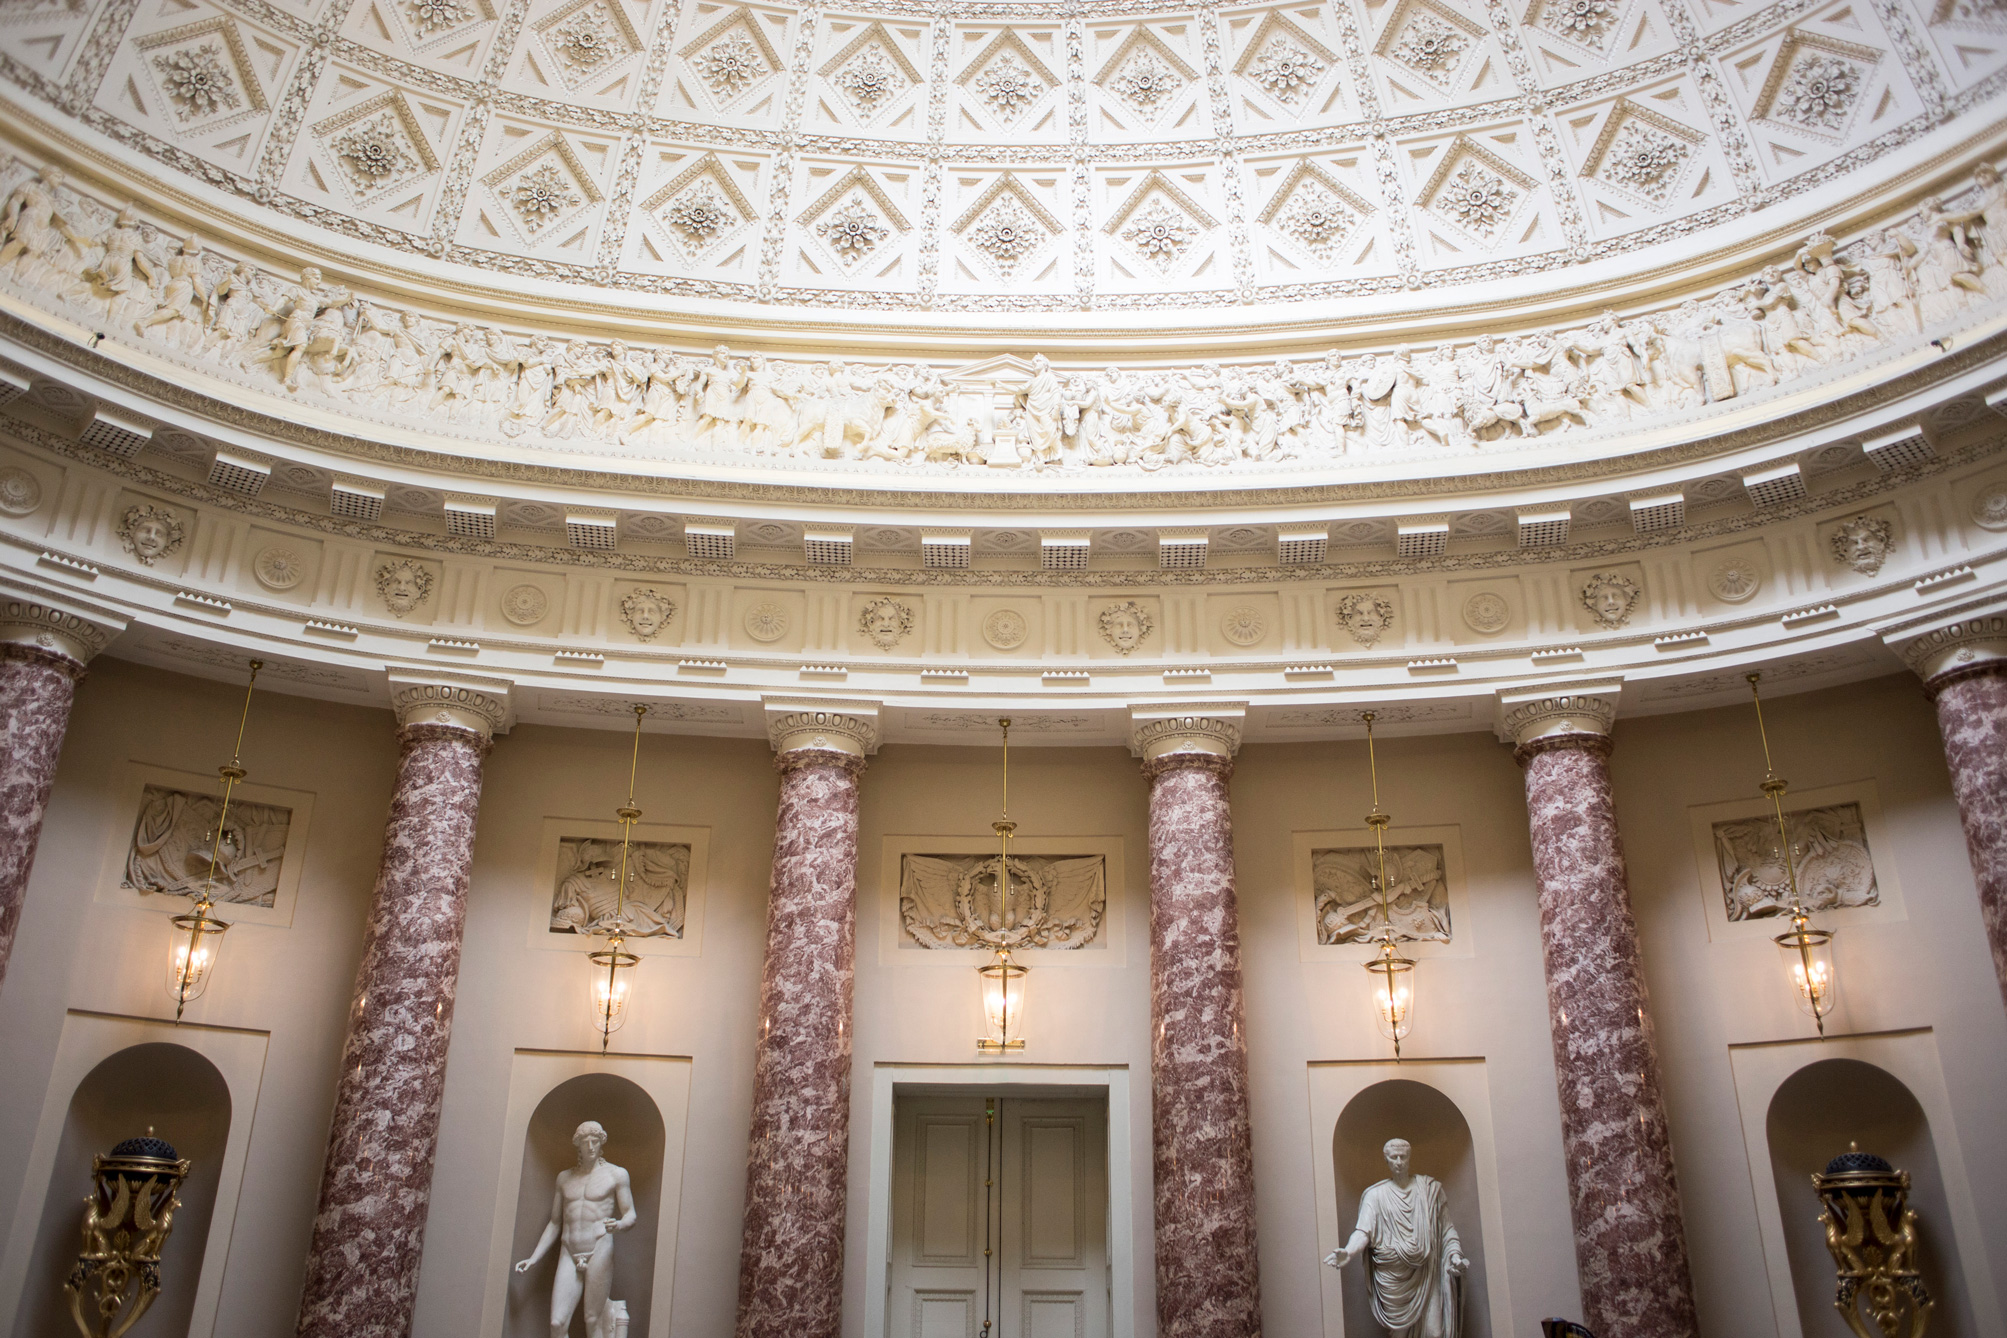 Stowe House, Ceremony, Marble, Luxury Wedding,